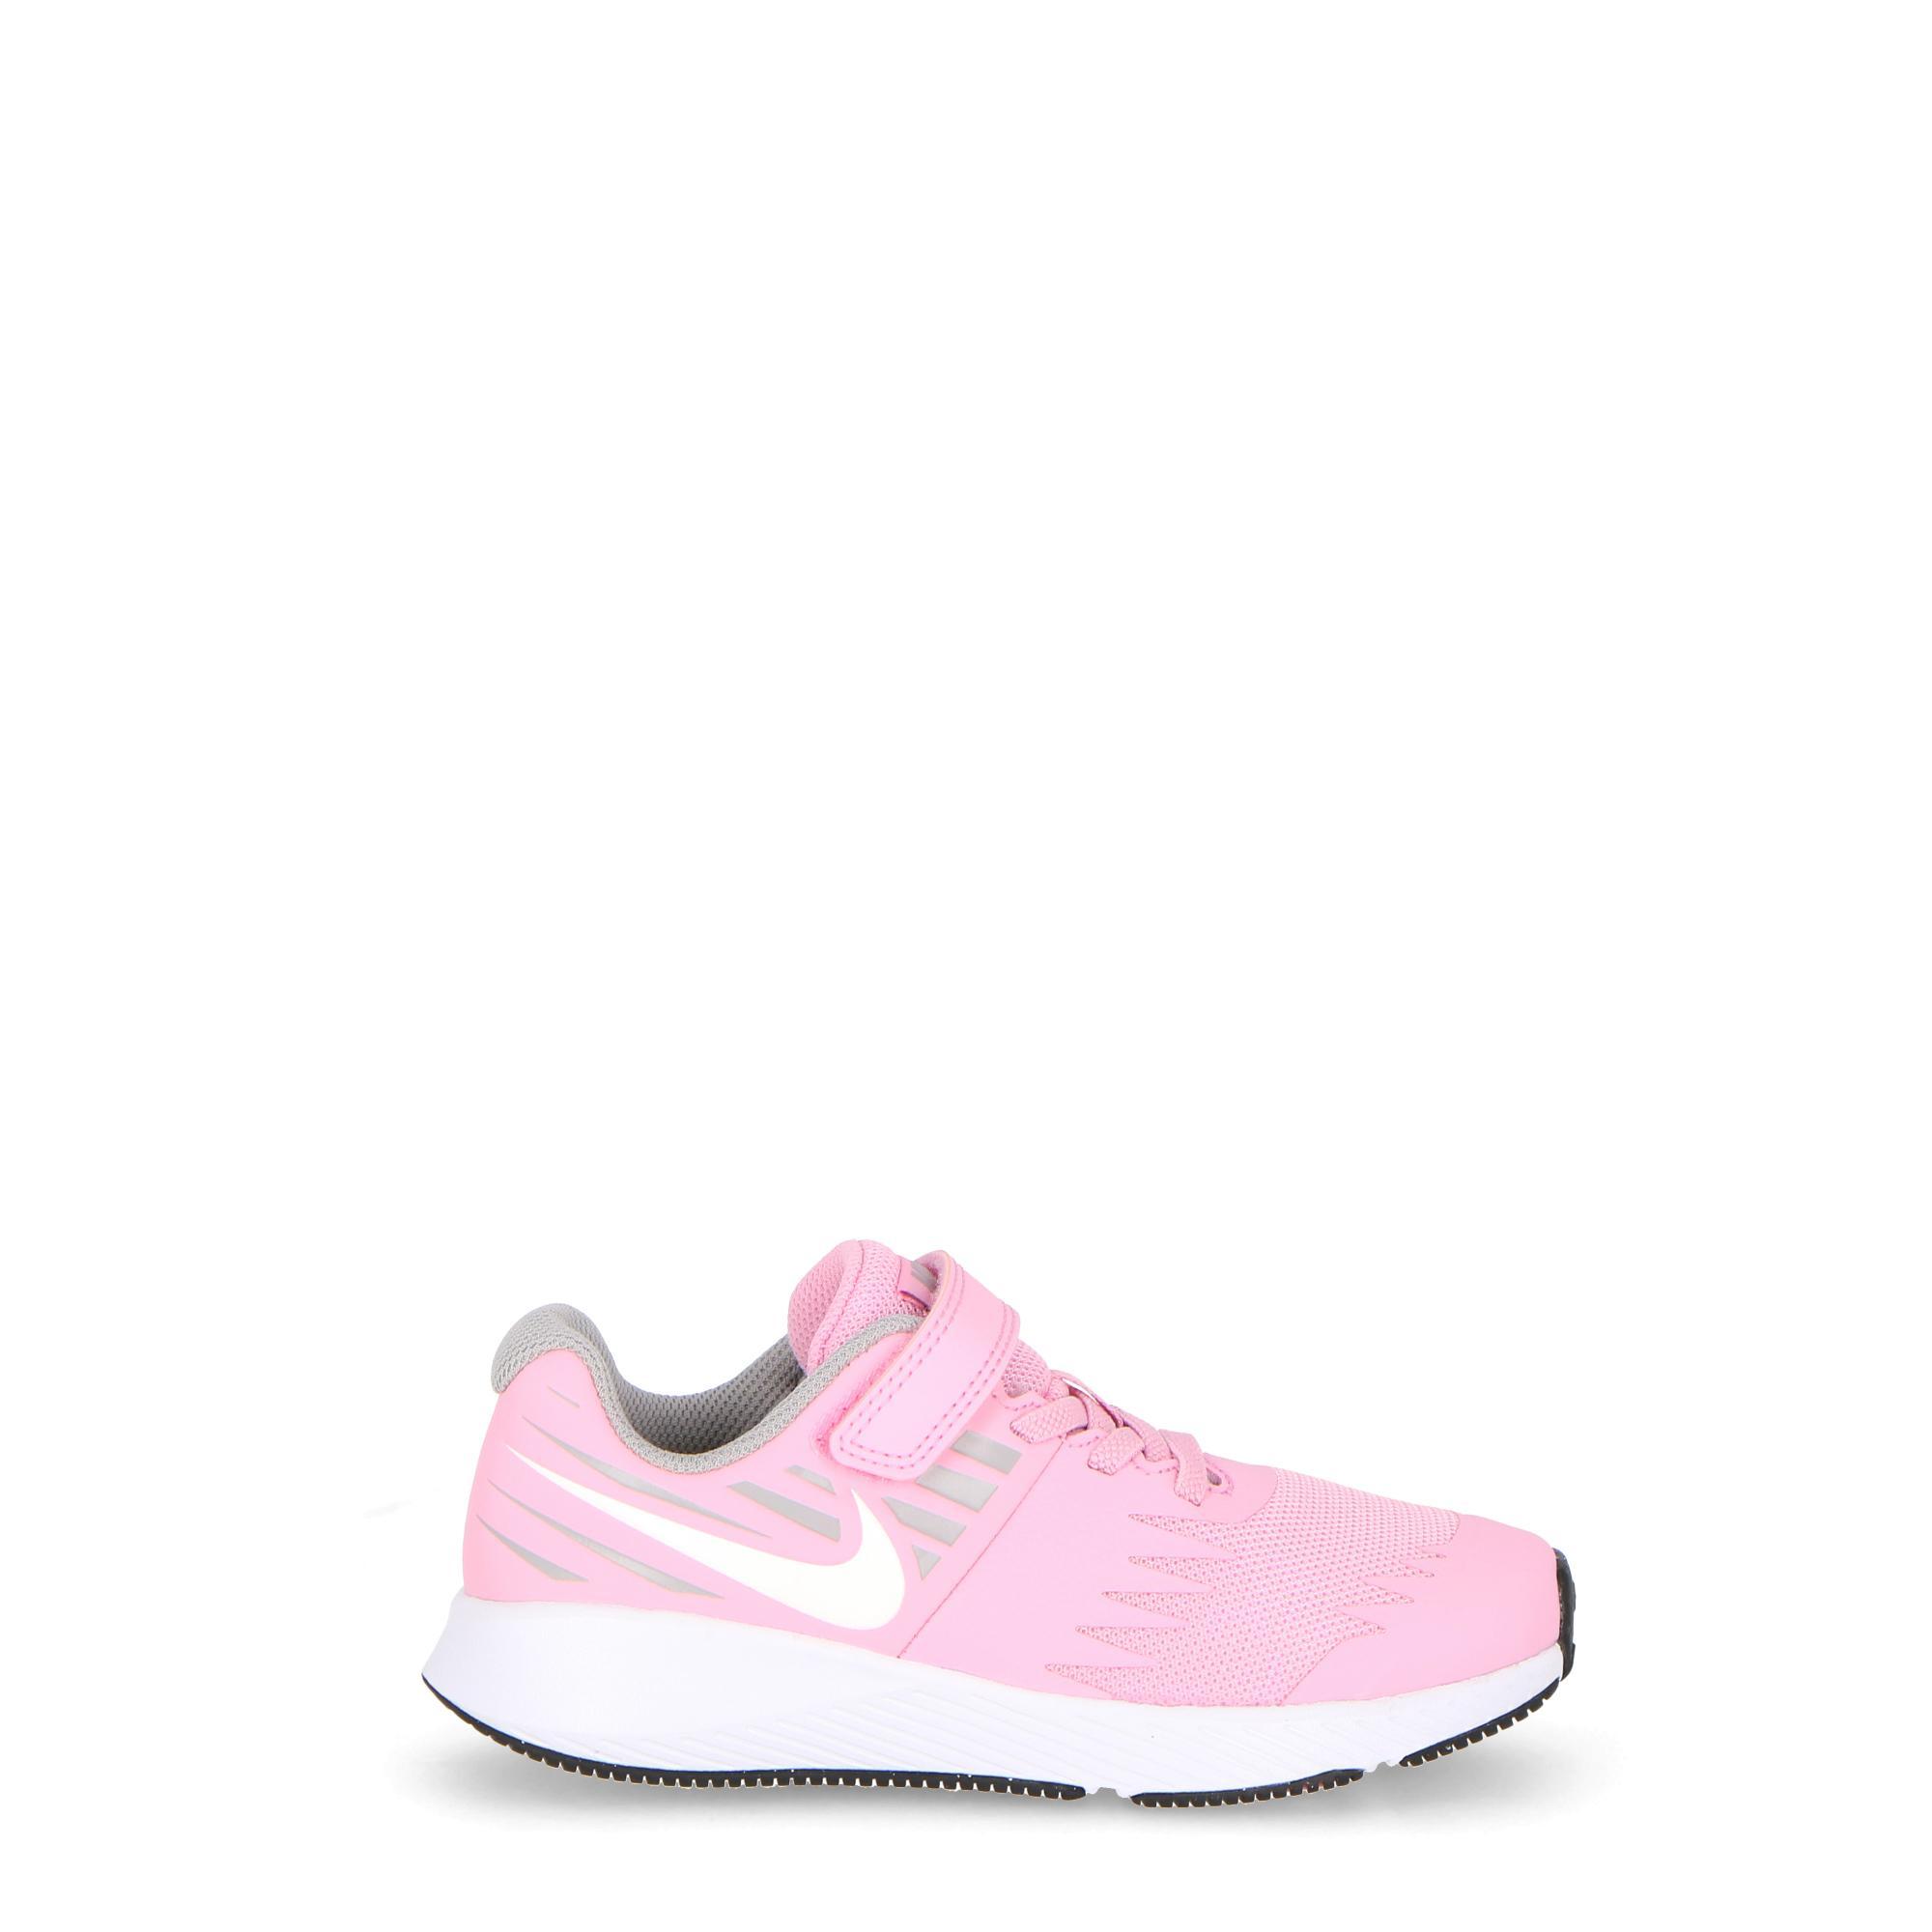 2ea54ad6 Nike Star Runner (psv) - Kids Pink Rise Wht Atmosphere Grey   Treesse